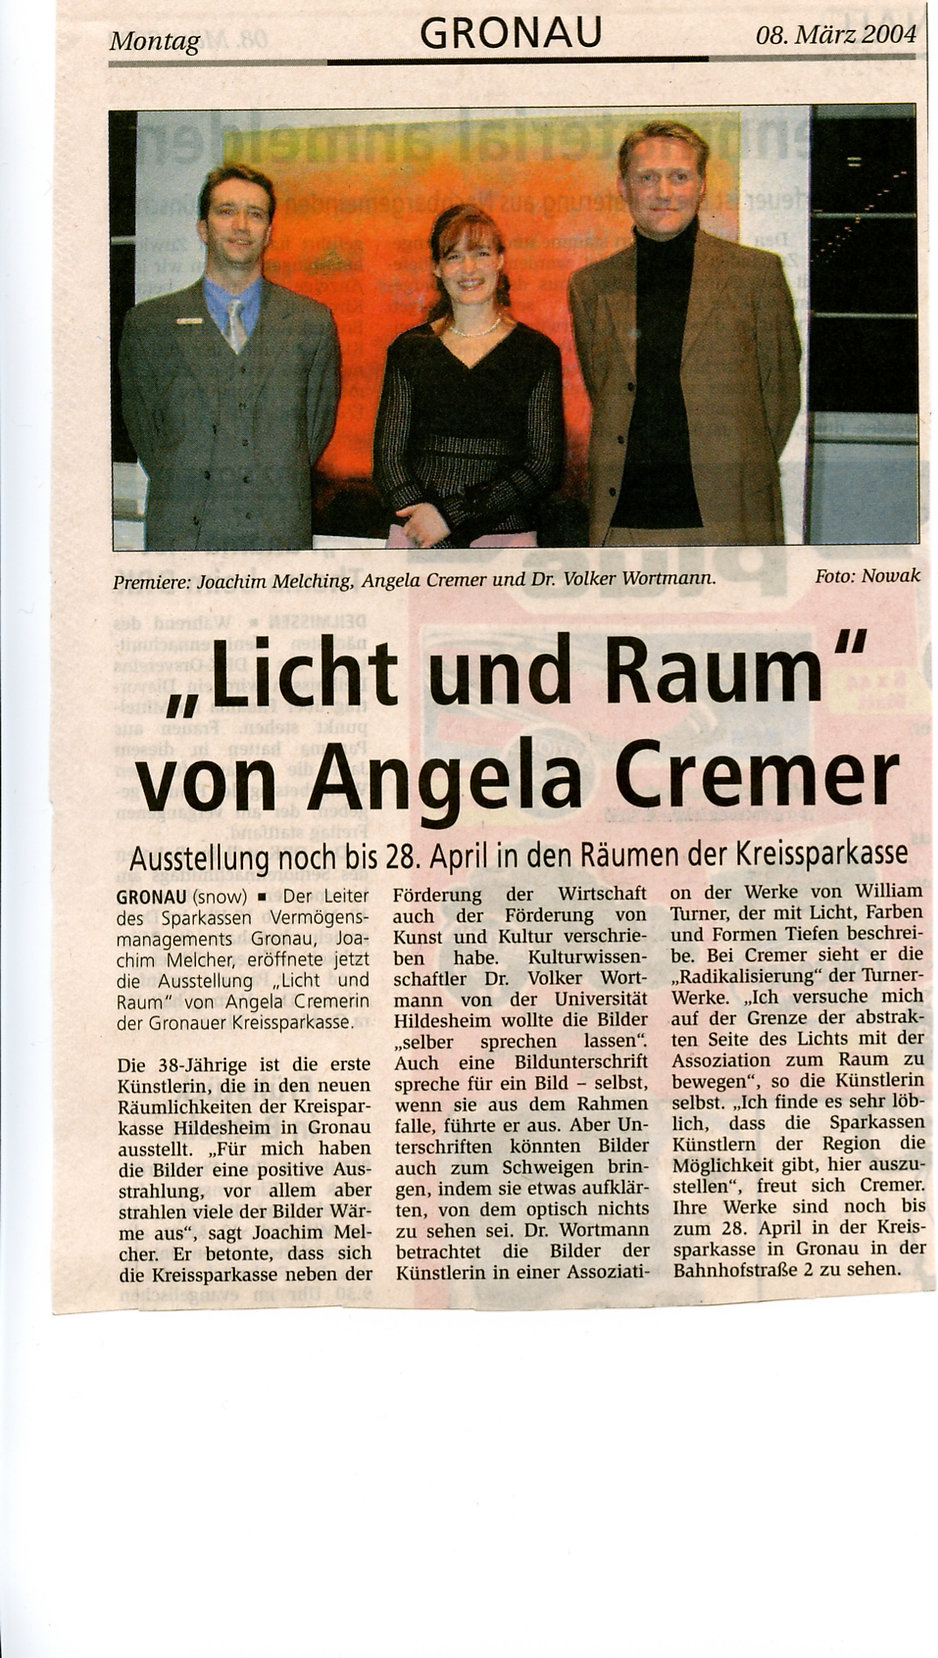 Angela_Cremer_KSK_Hildesheim.JPG